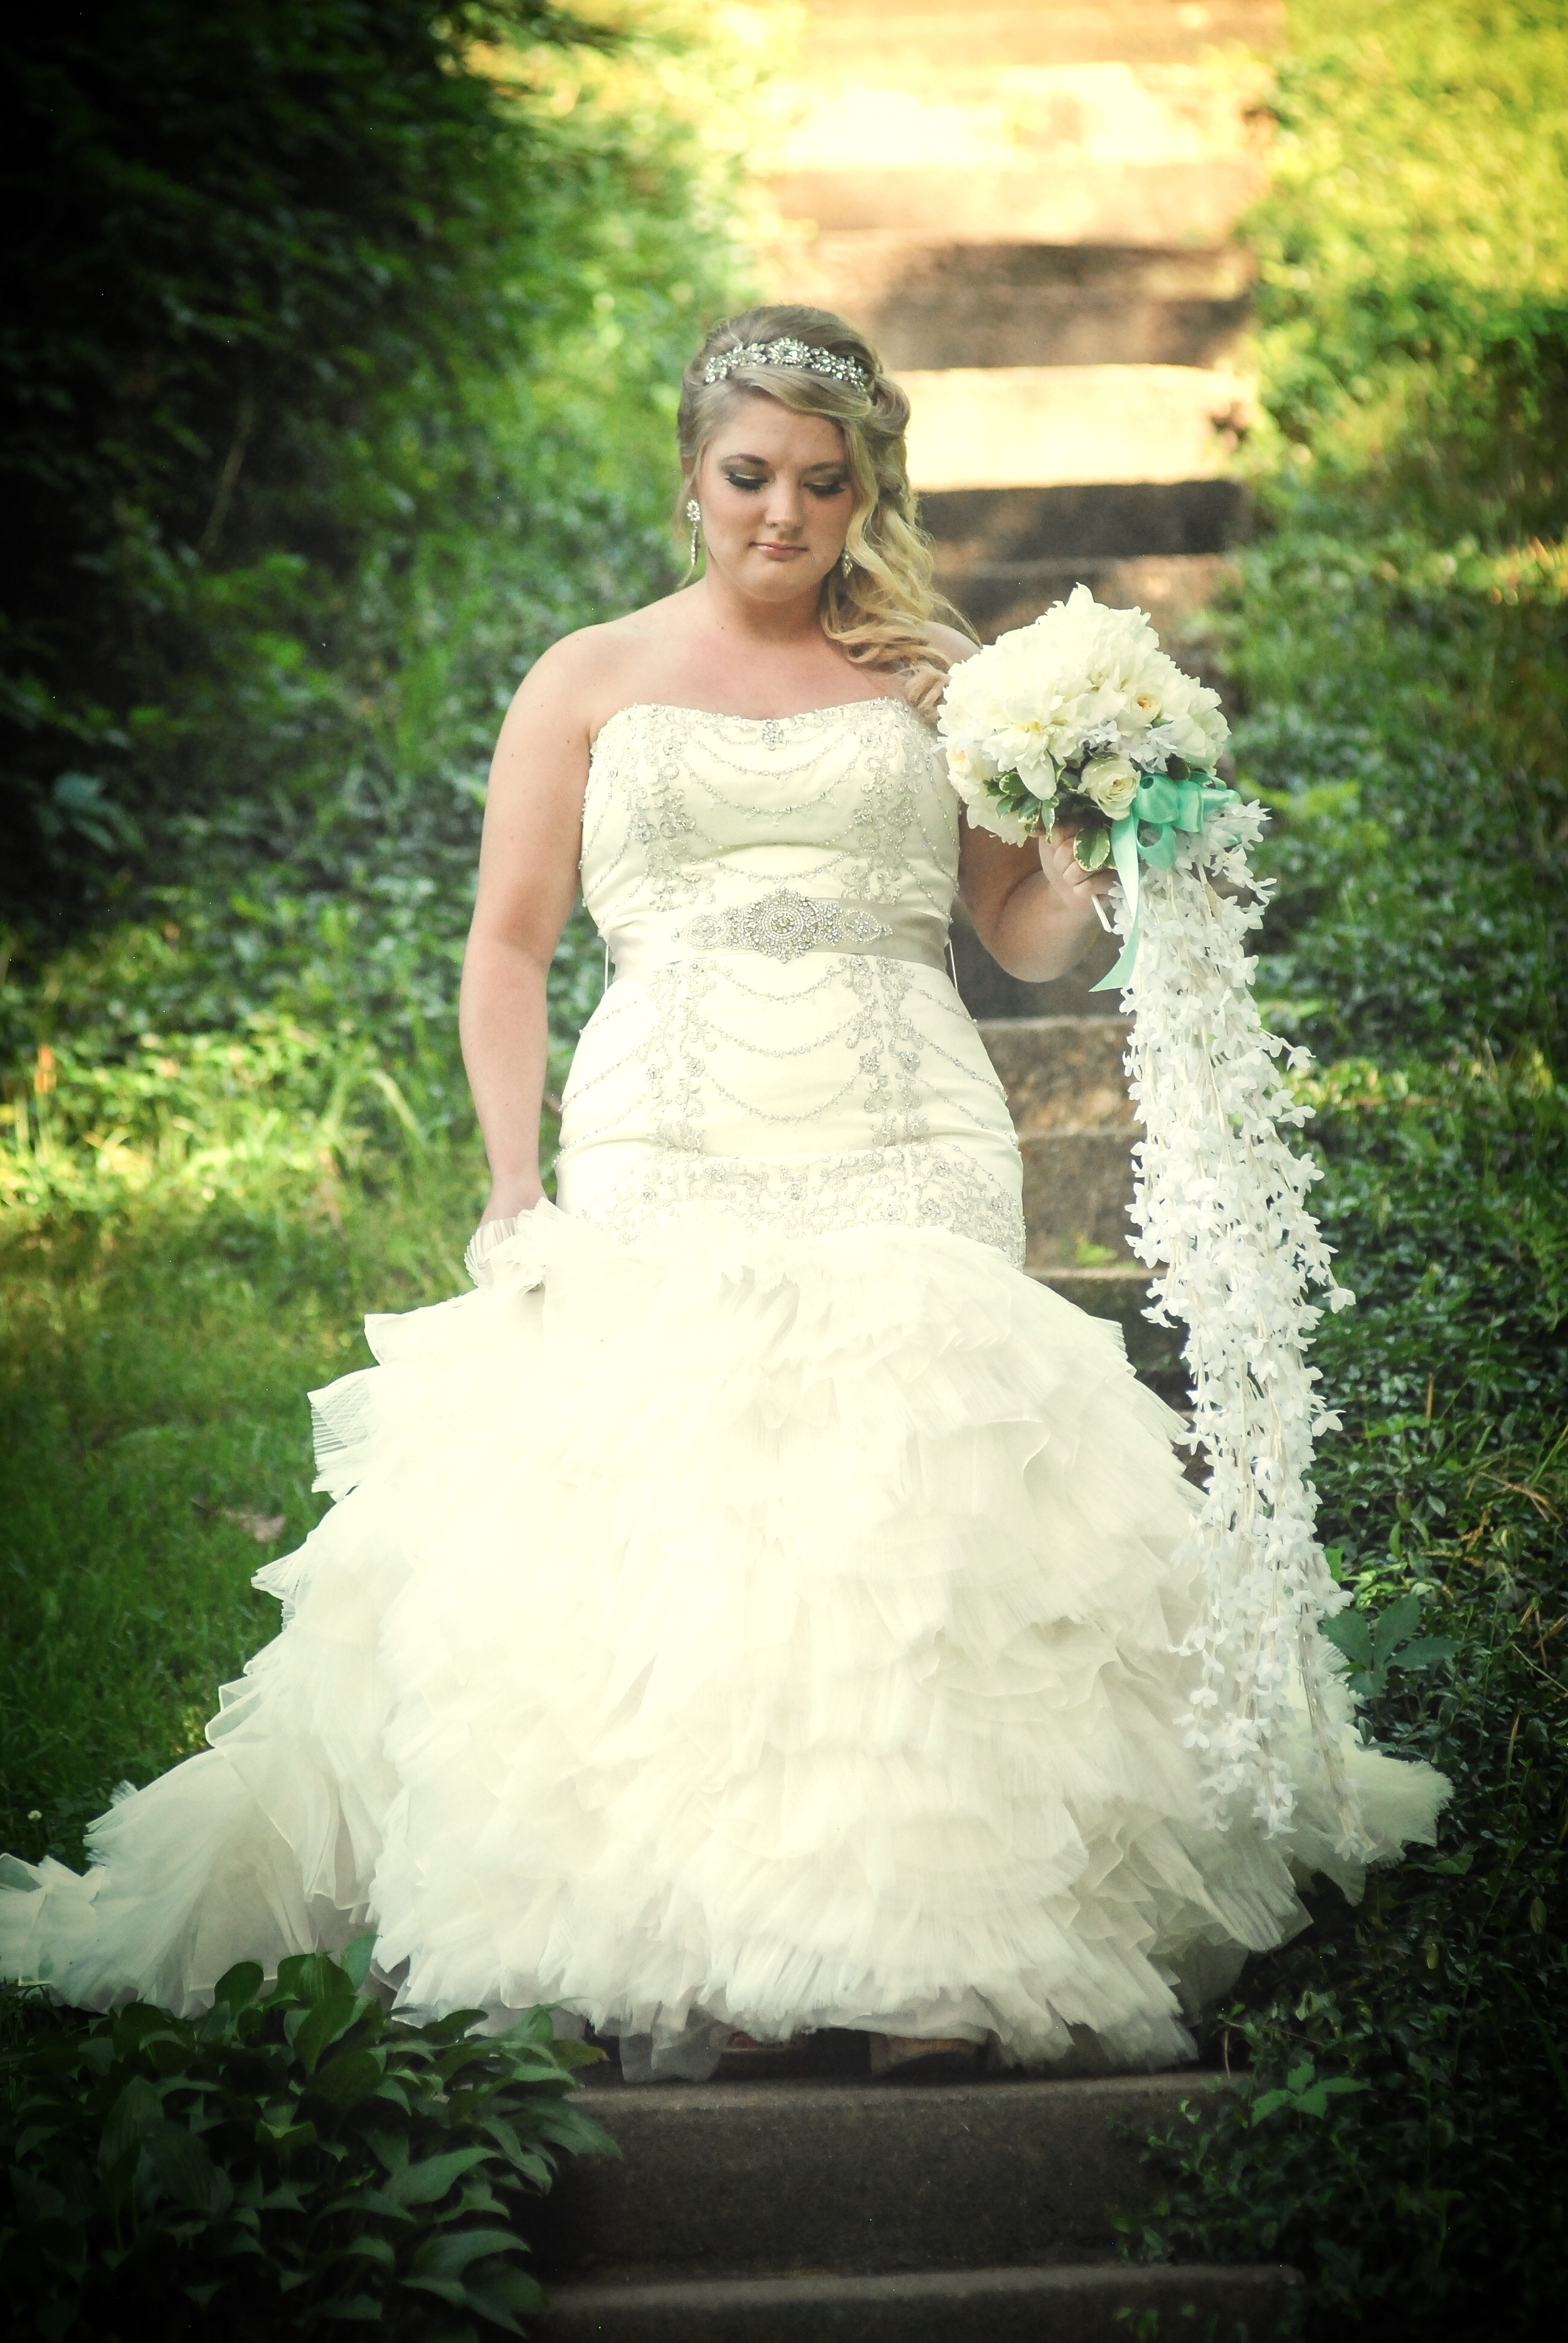 Kristina levis wedding